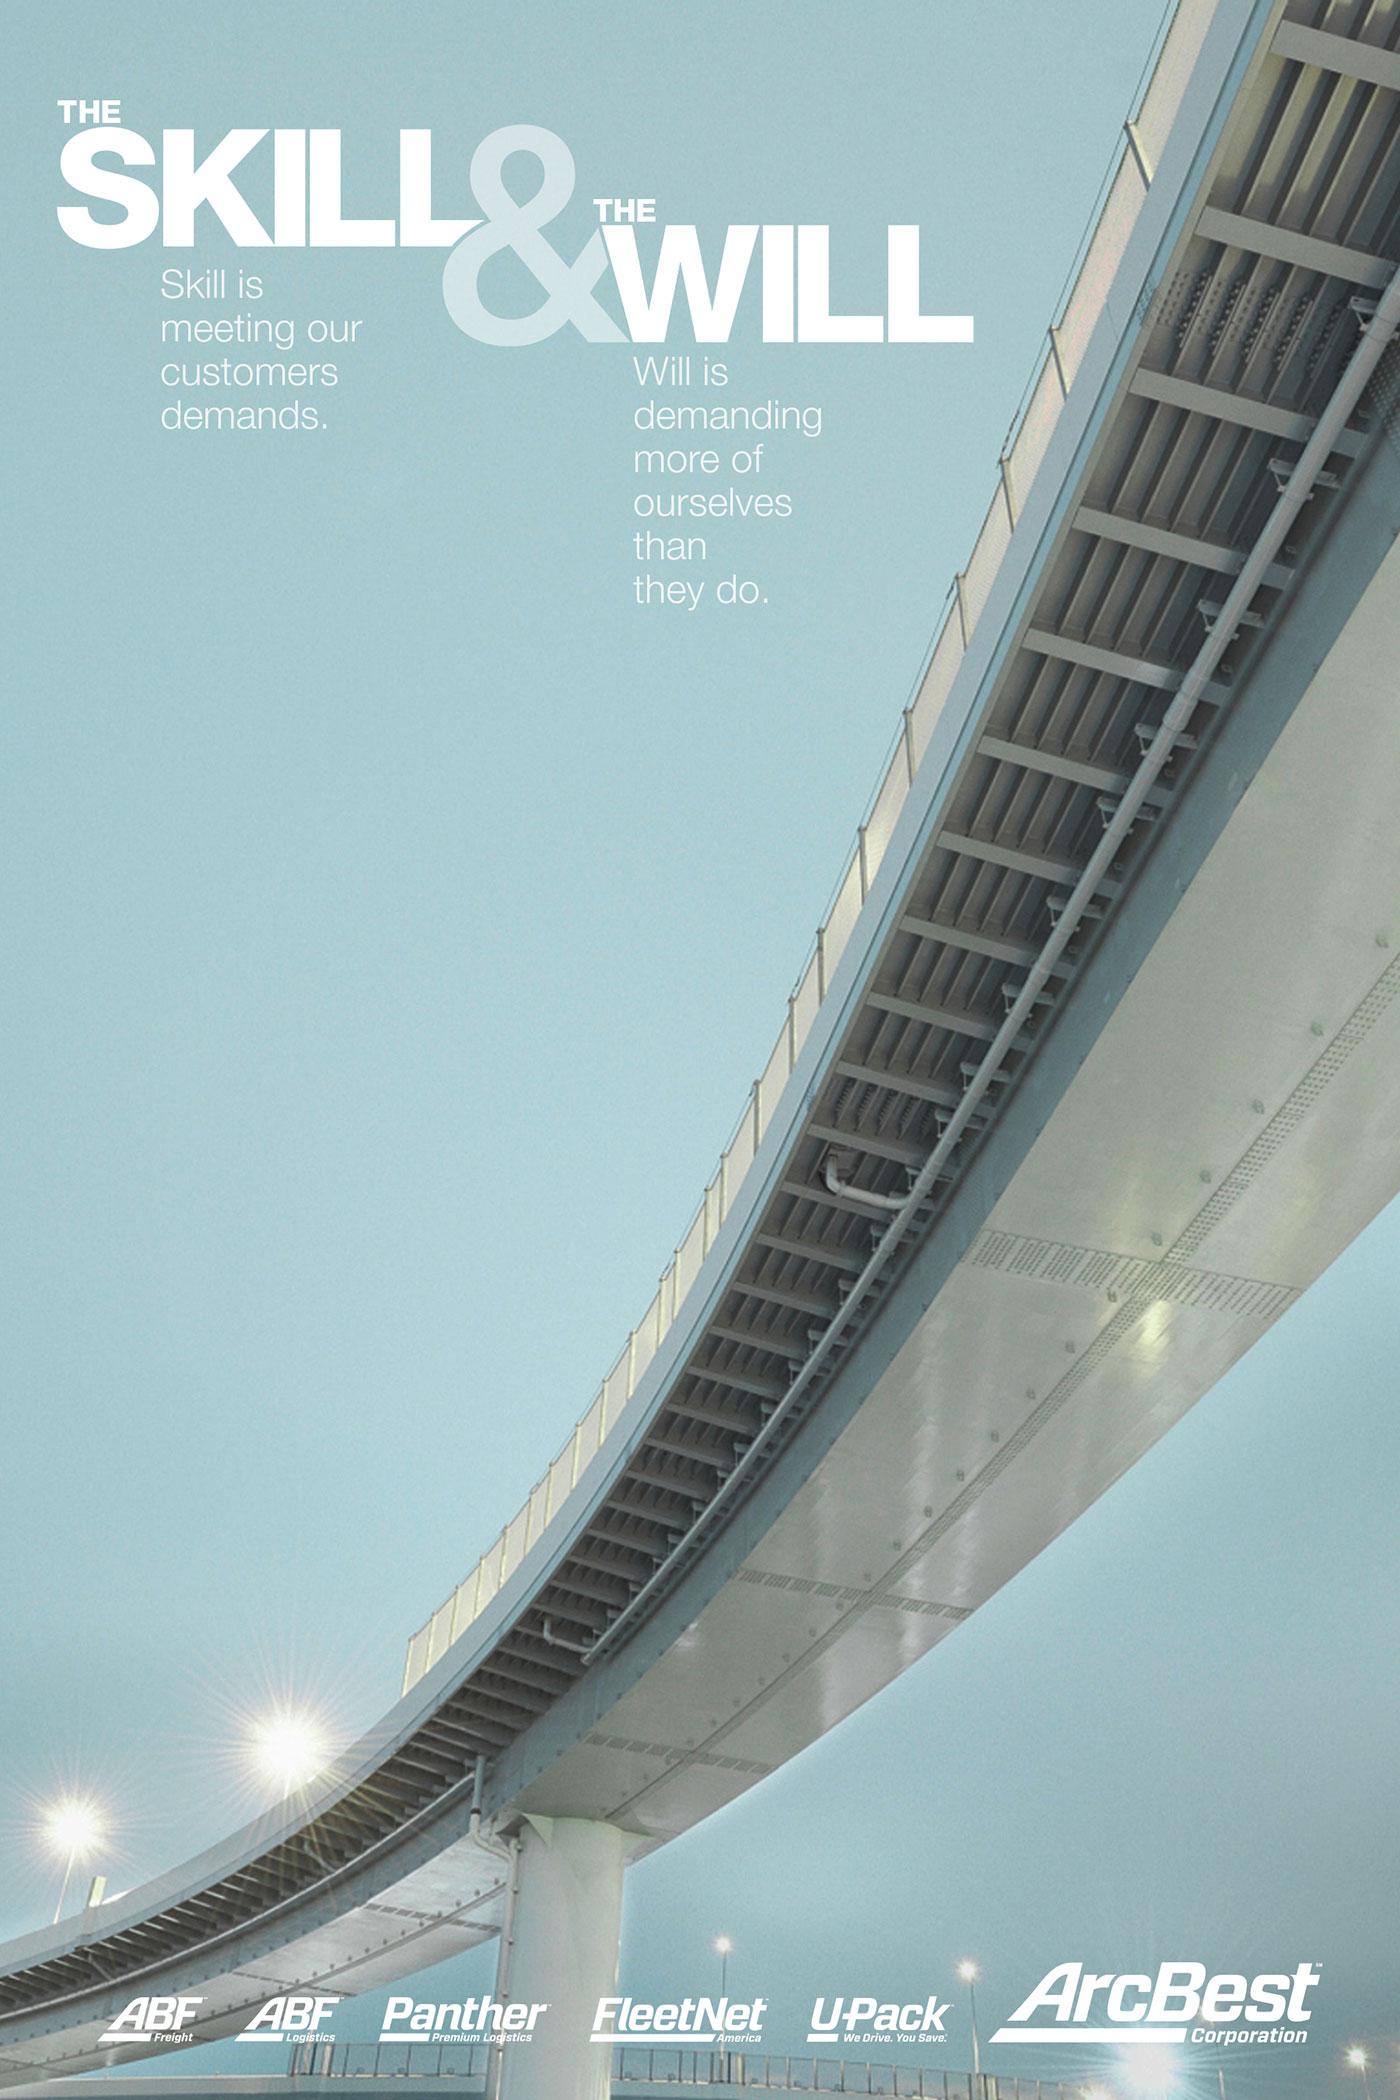 SW_posters_Highway.jpg